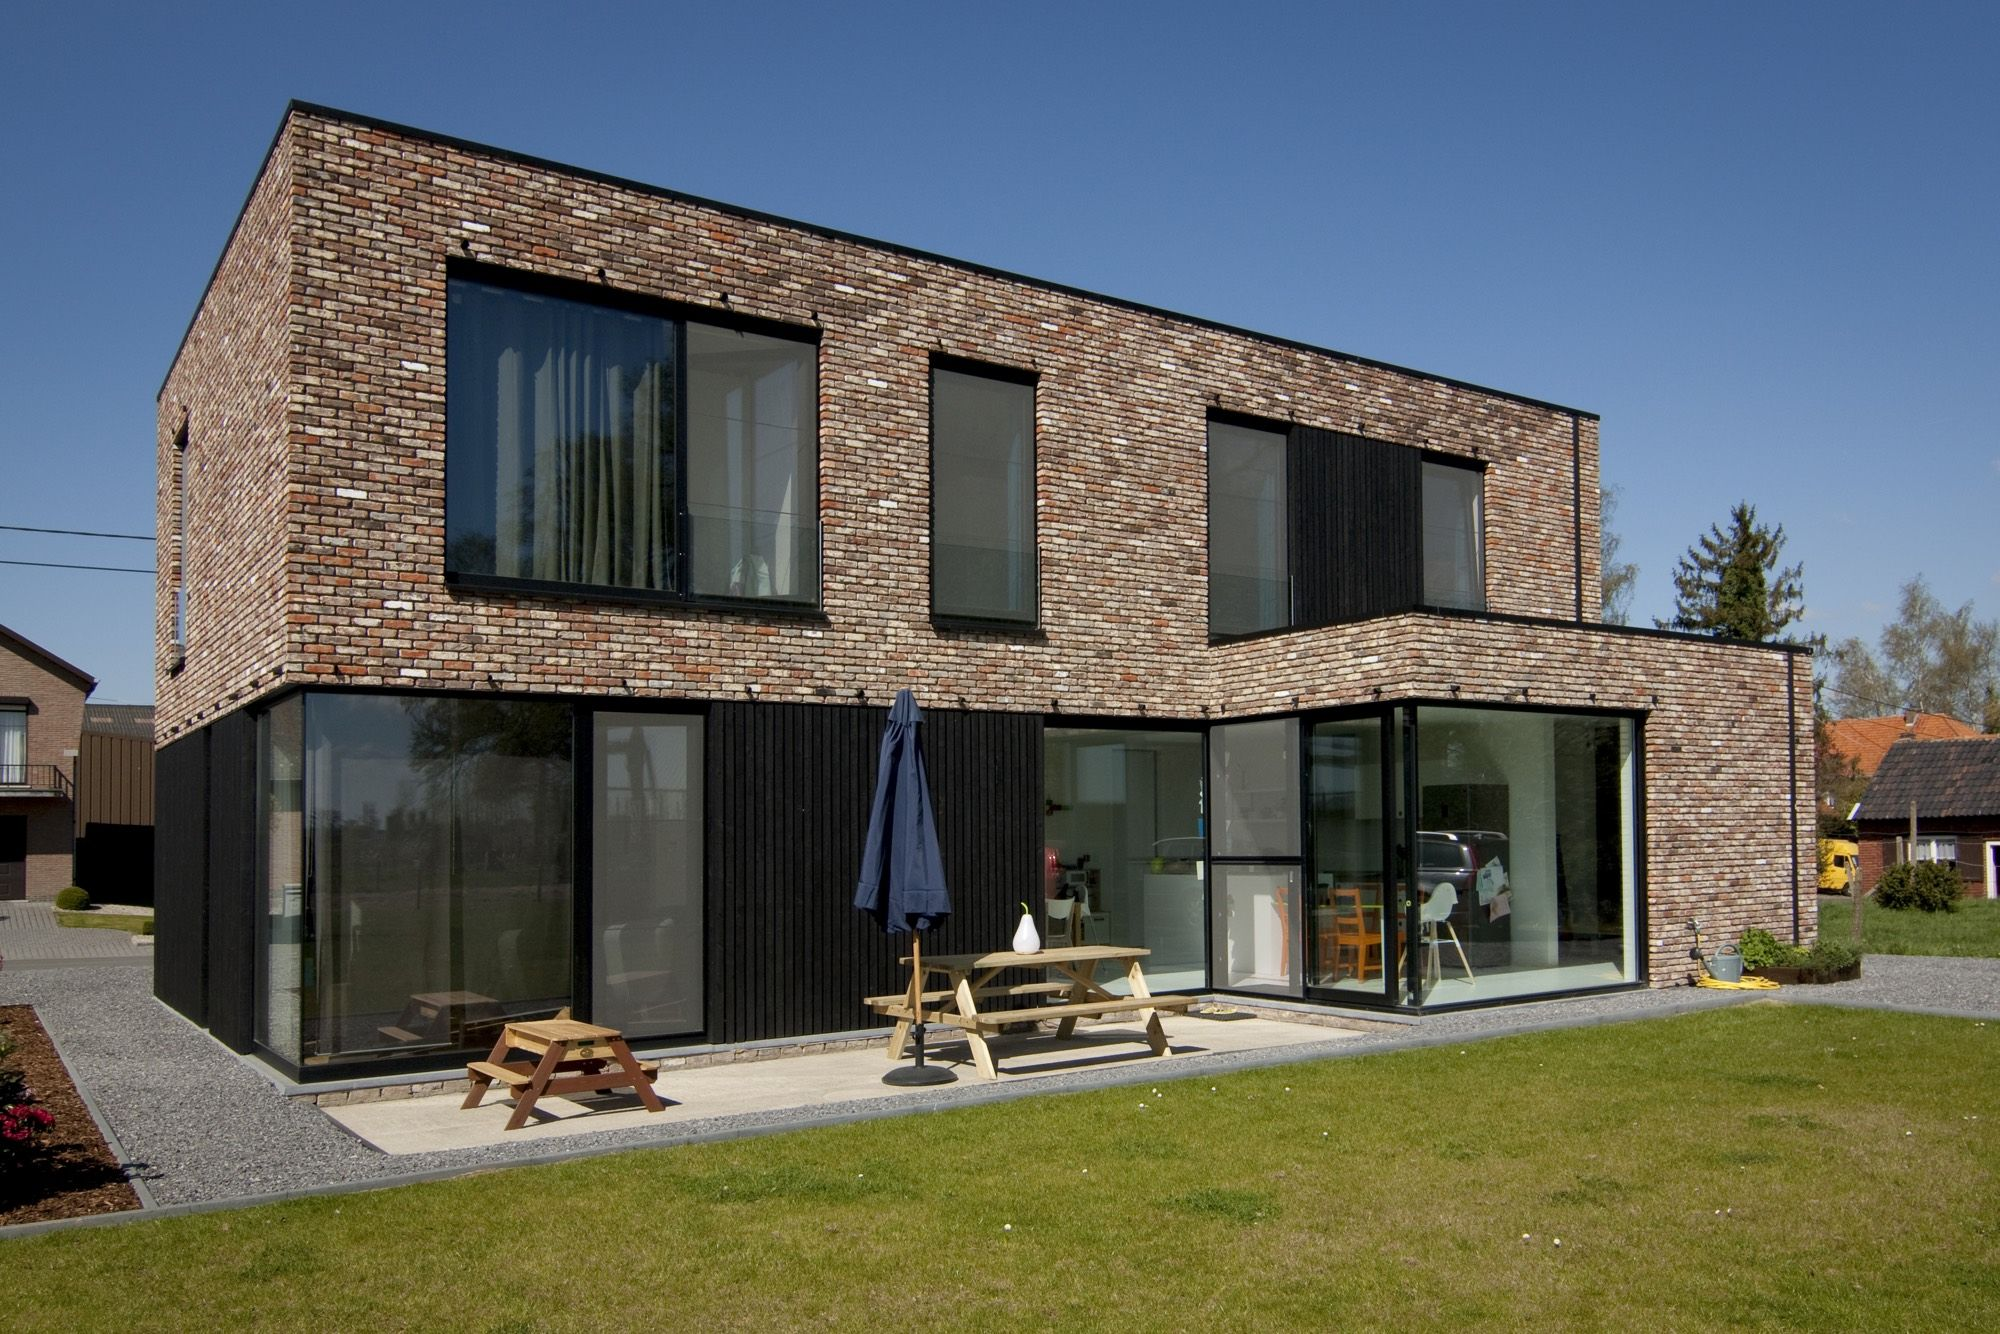 Block office architecten hedendaagse woning te alken strakke